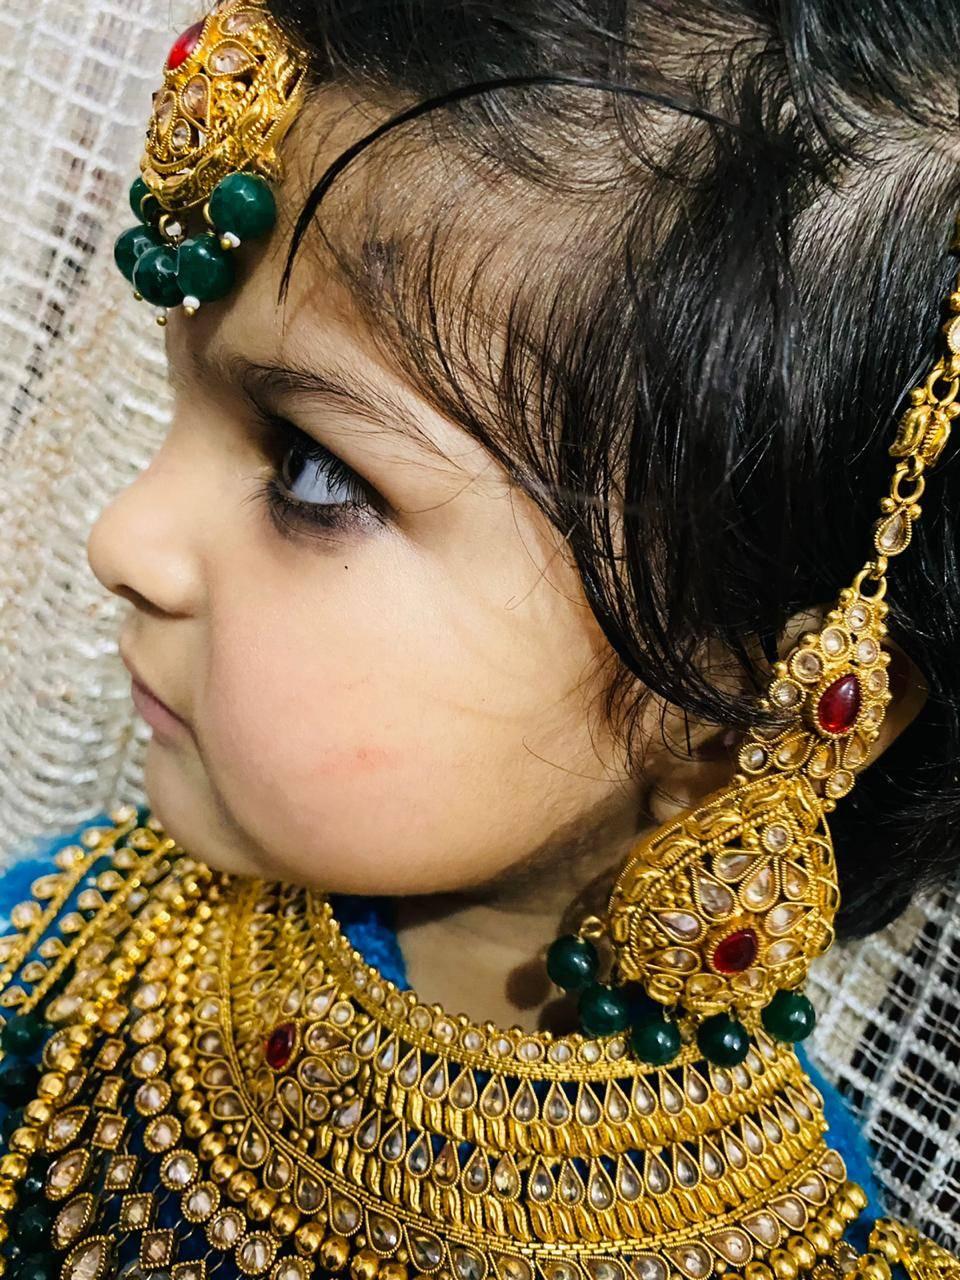 Sourabh